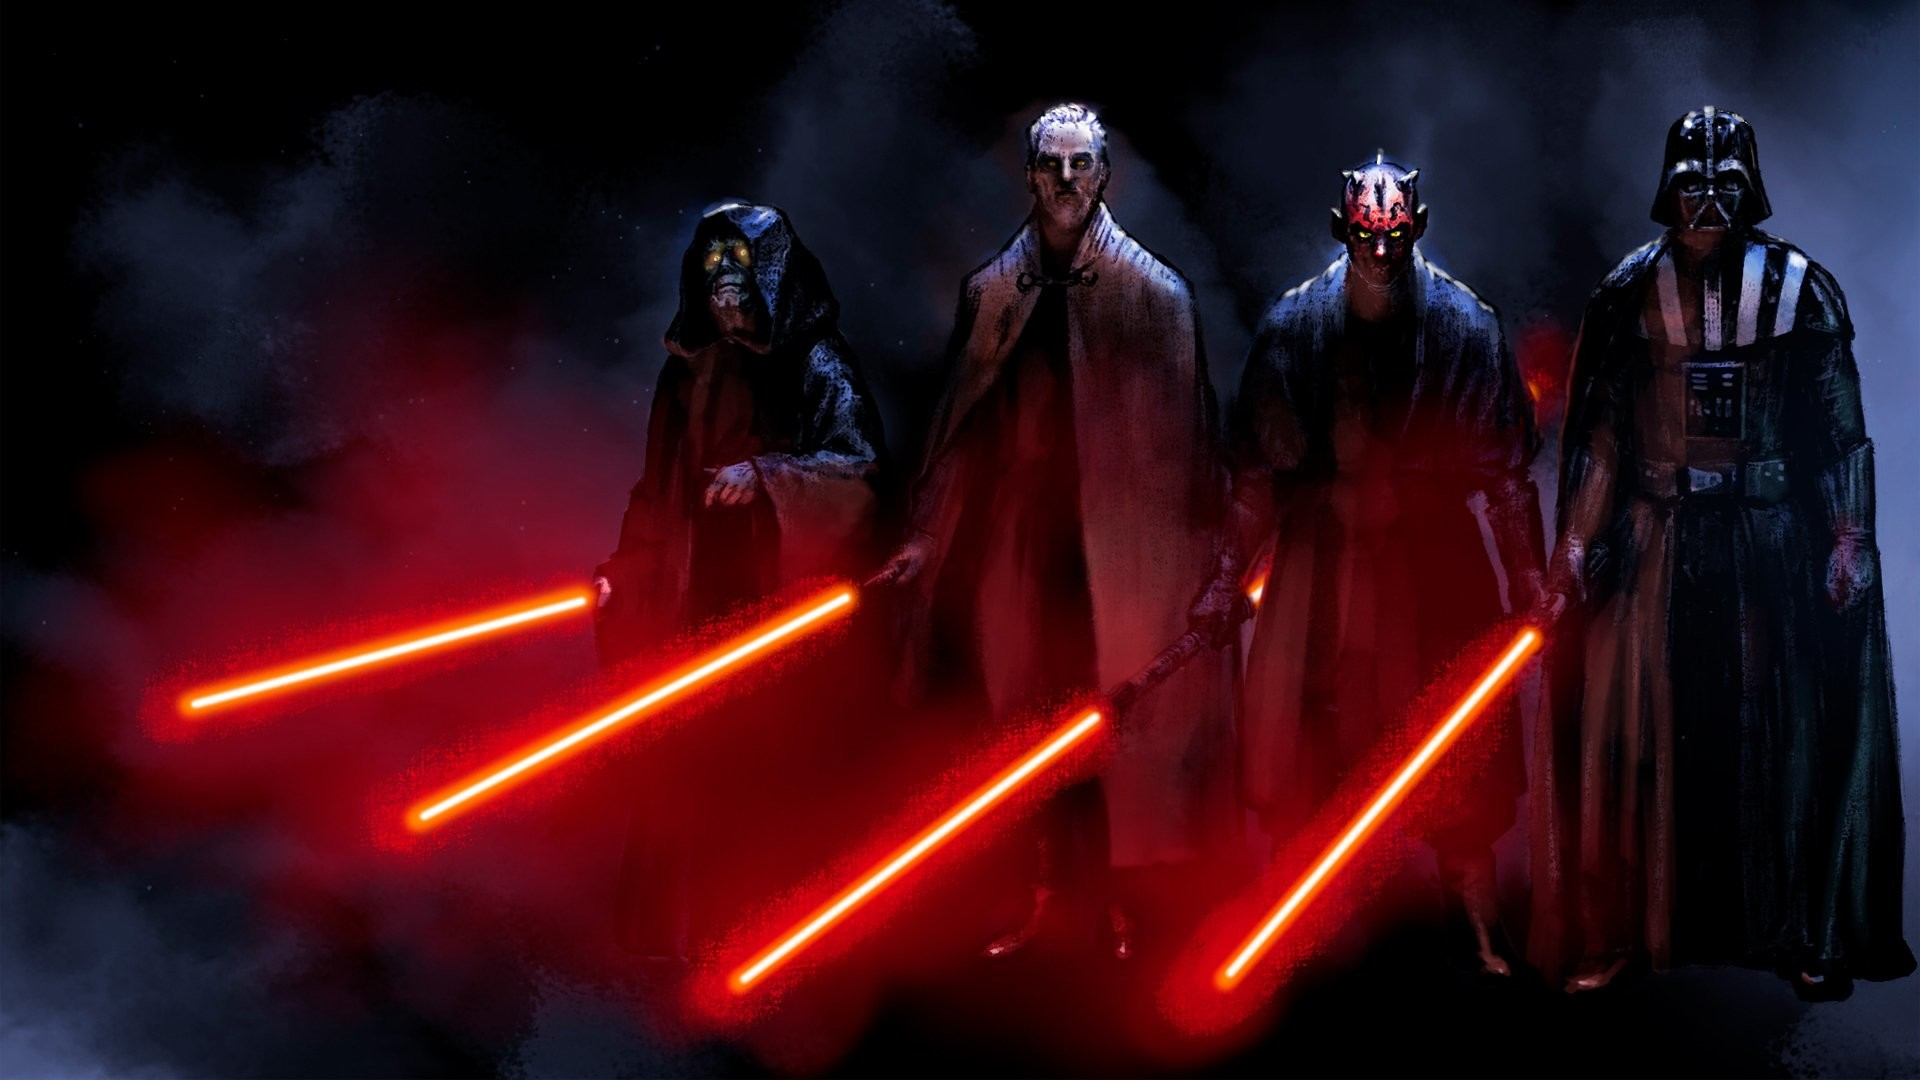 Res: 1920x1080, Filme - Star Wars Darth Vader Darth Maul Sith (Star Wars) Wallpaper